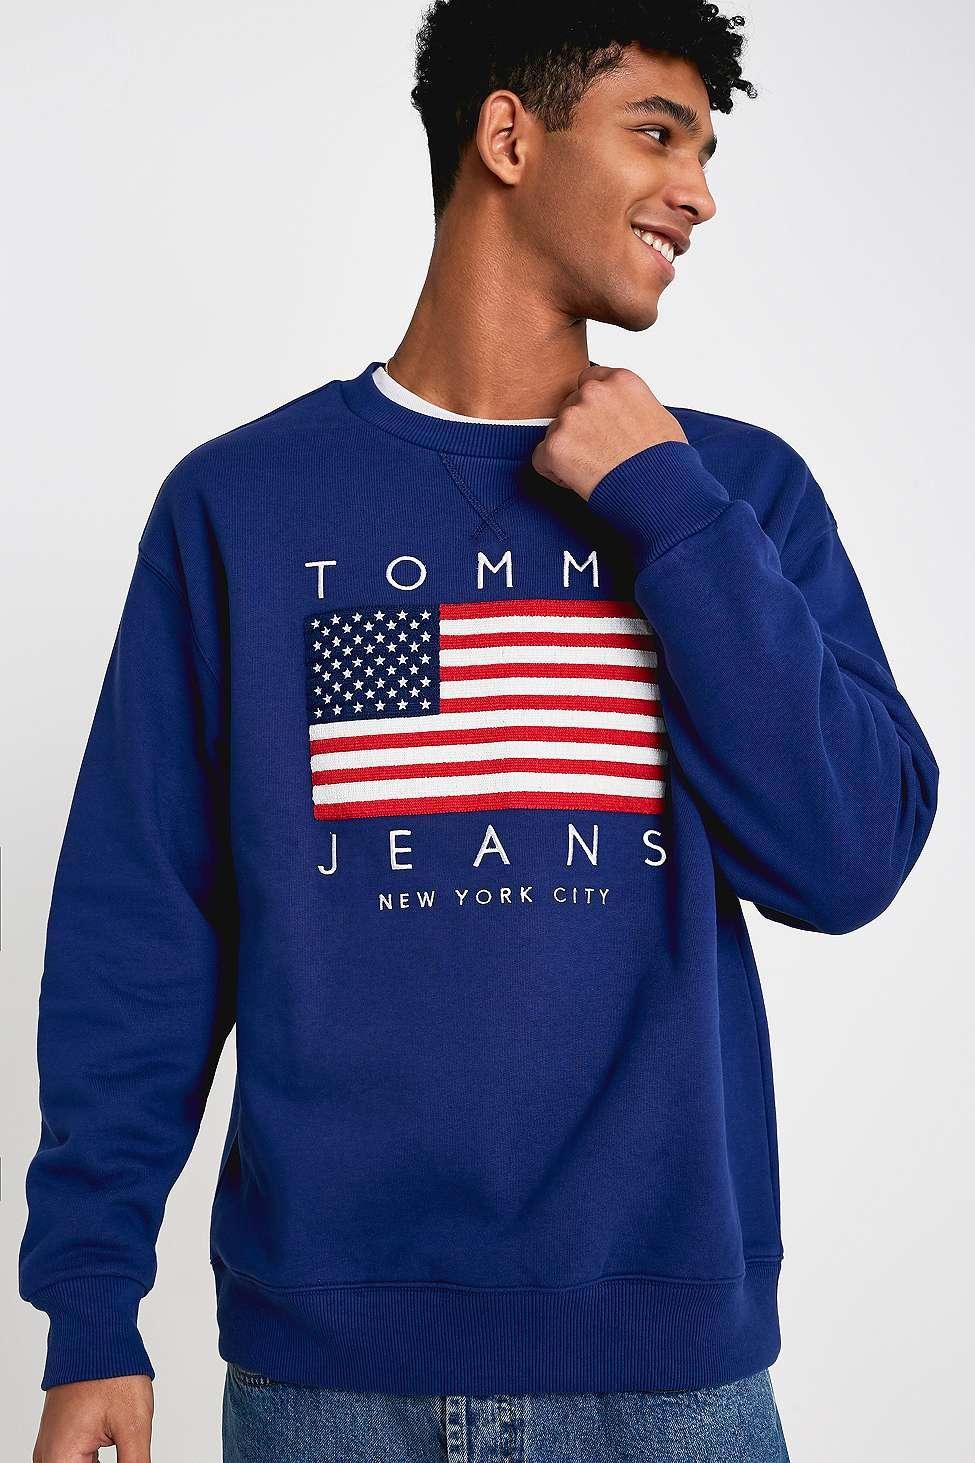 a1858edb8876 Tommy Hilfiger Usa Flag Print Blue Sweatshirt - Mens S in Blue for ...